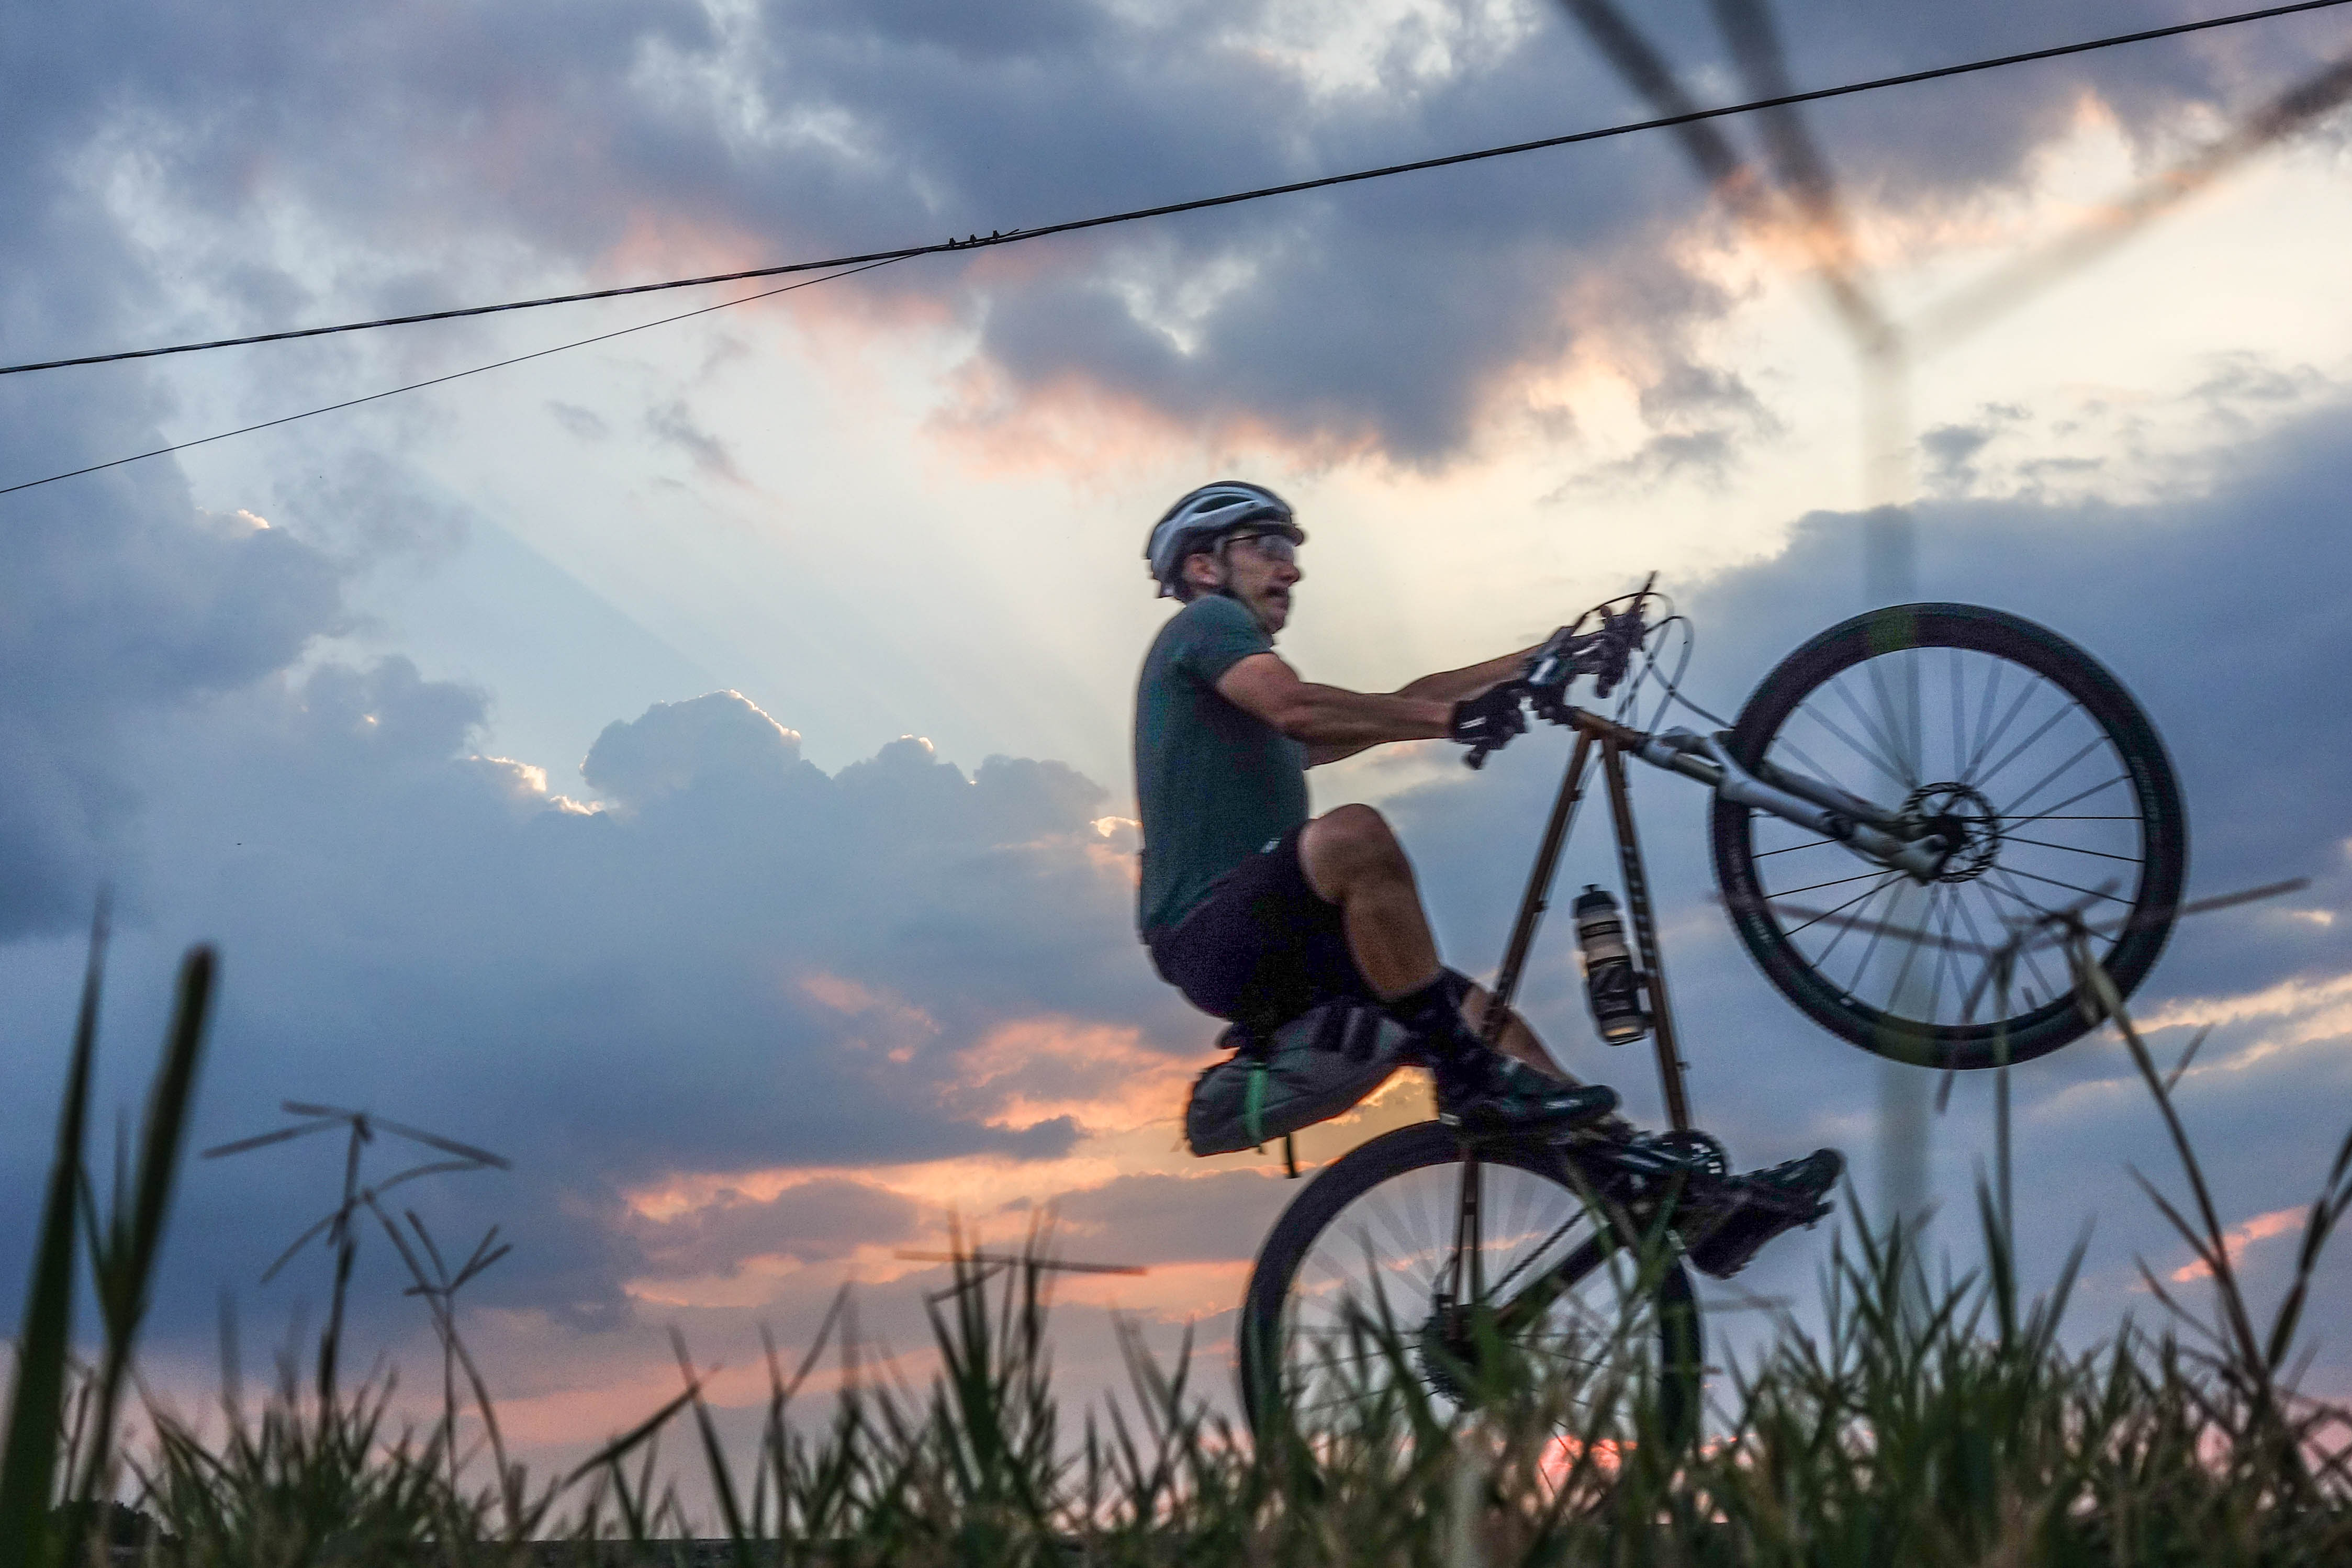 erman-bike-emilio-tarantola-orme-maranello-mtb-1